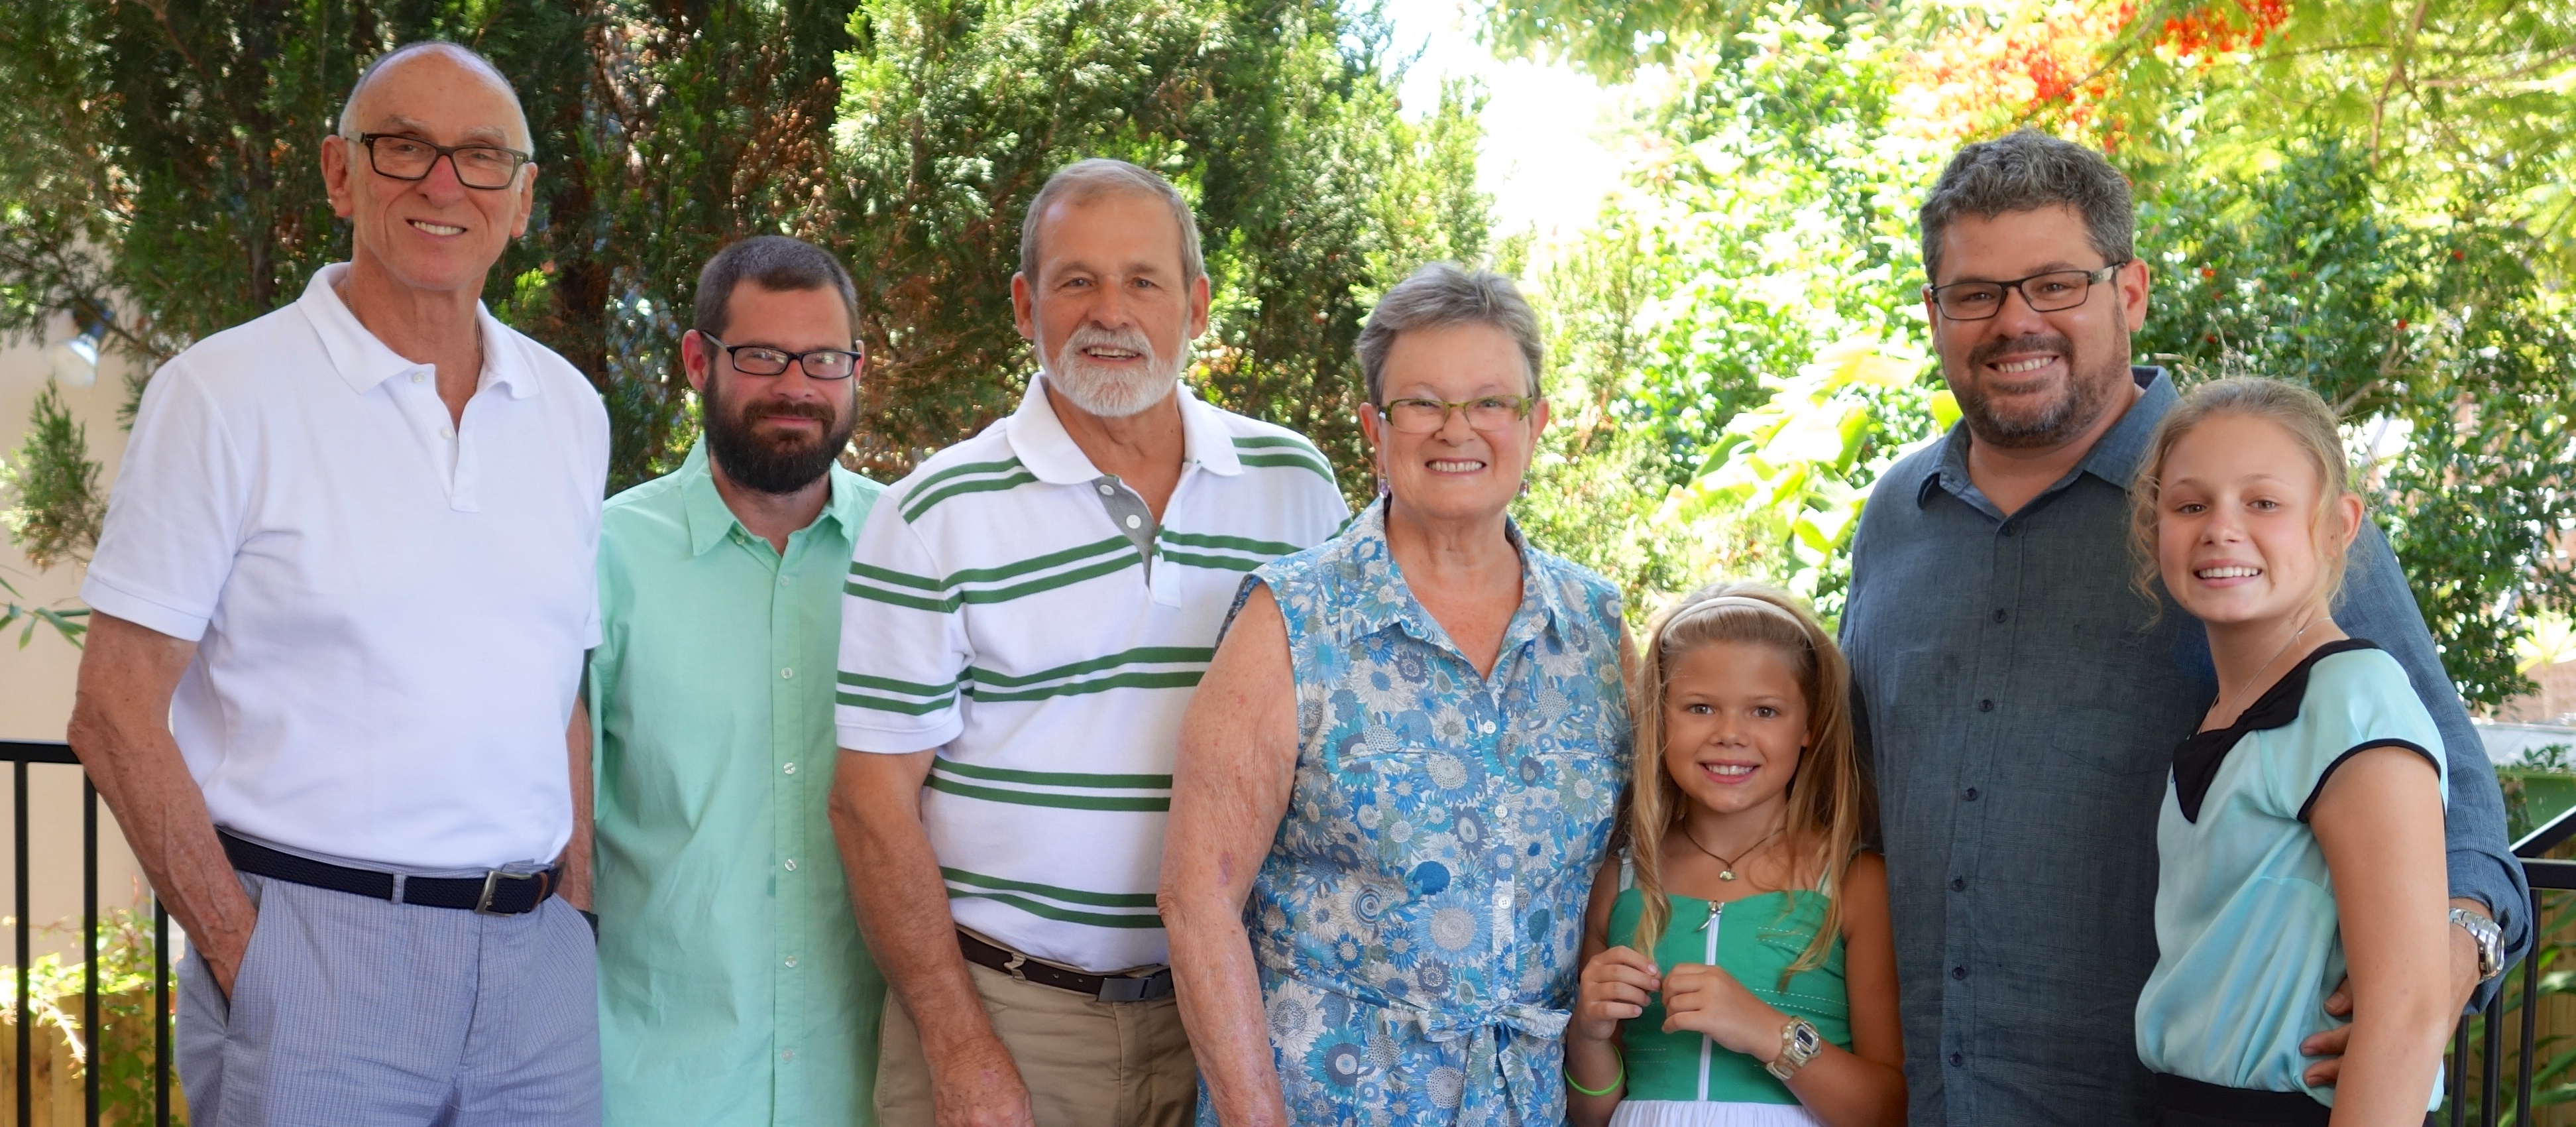 Uncle Michael joins the Schramm families